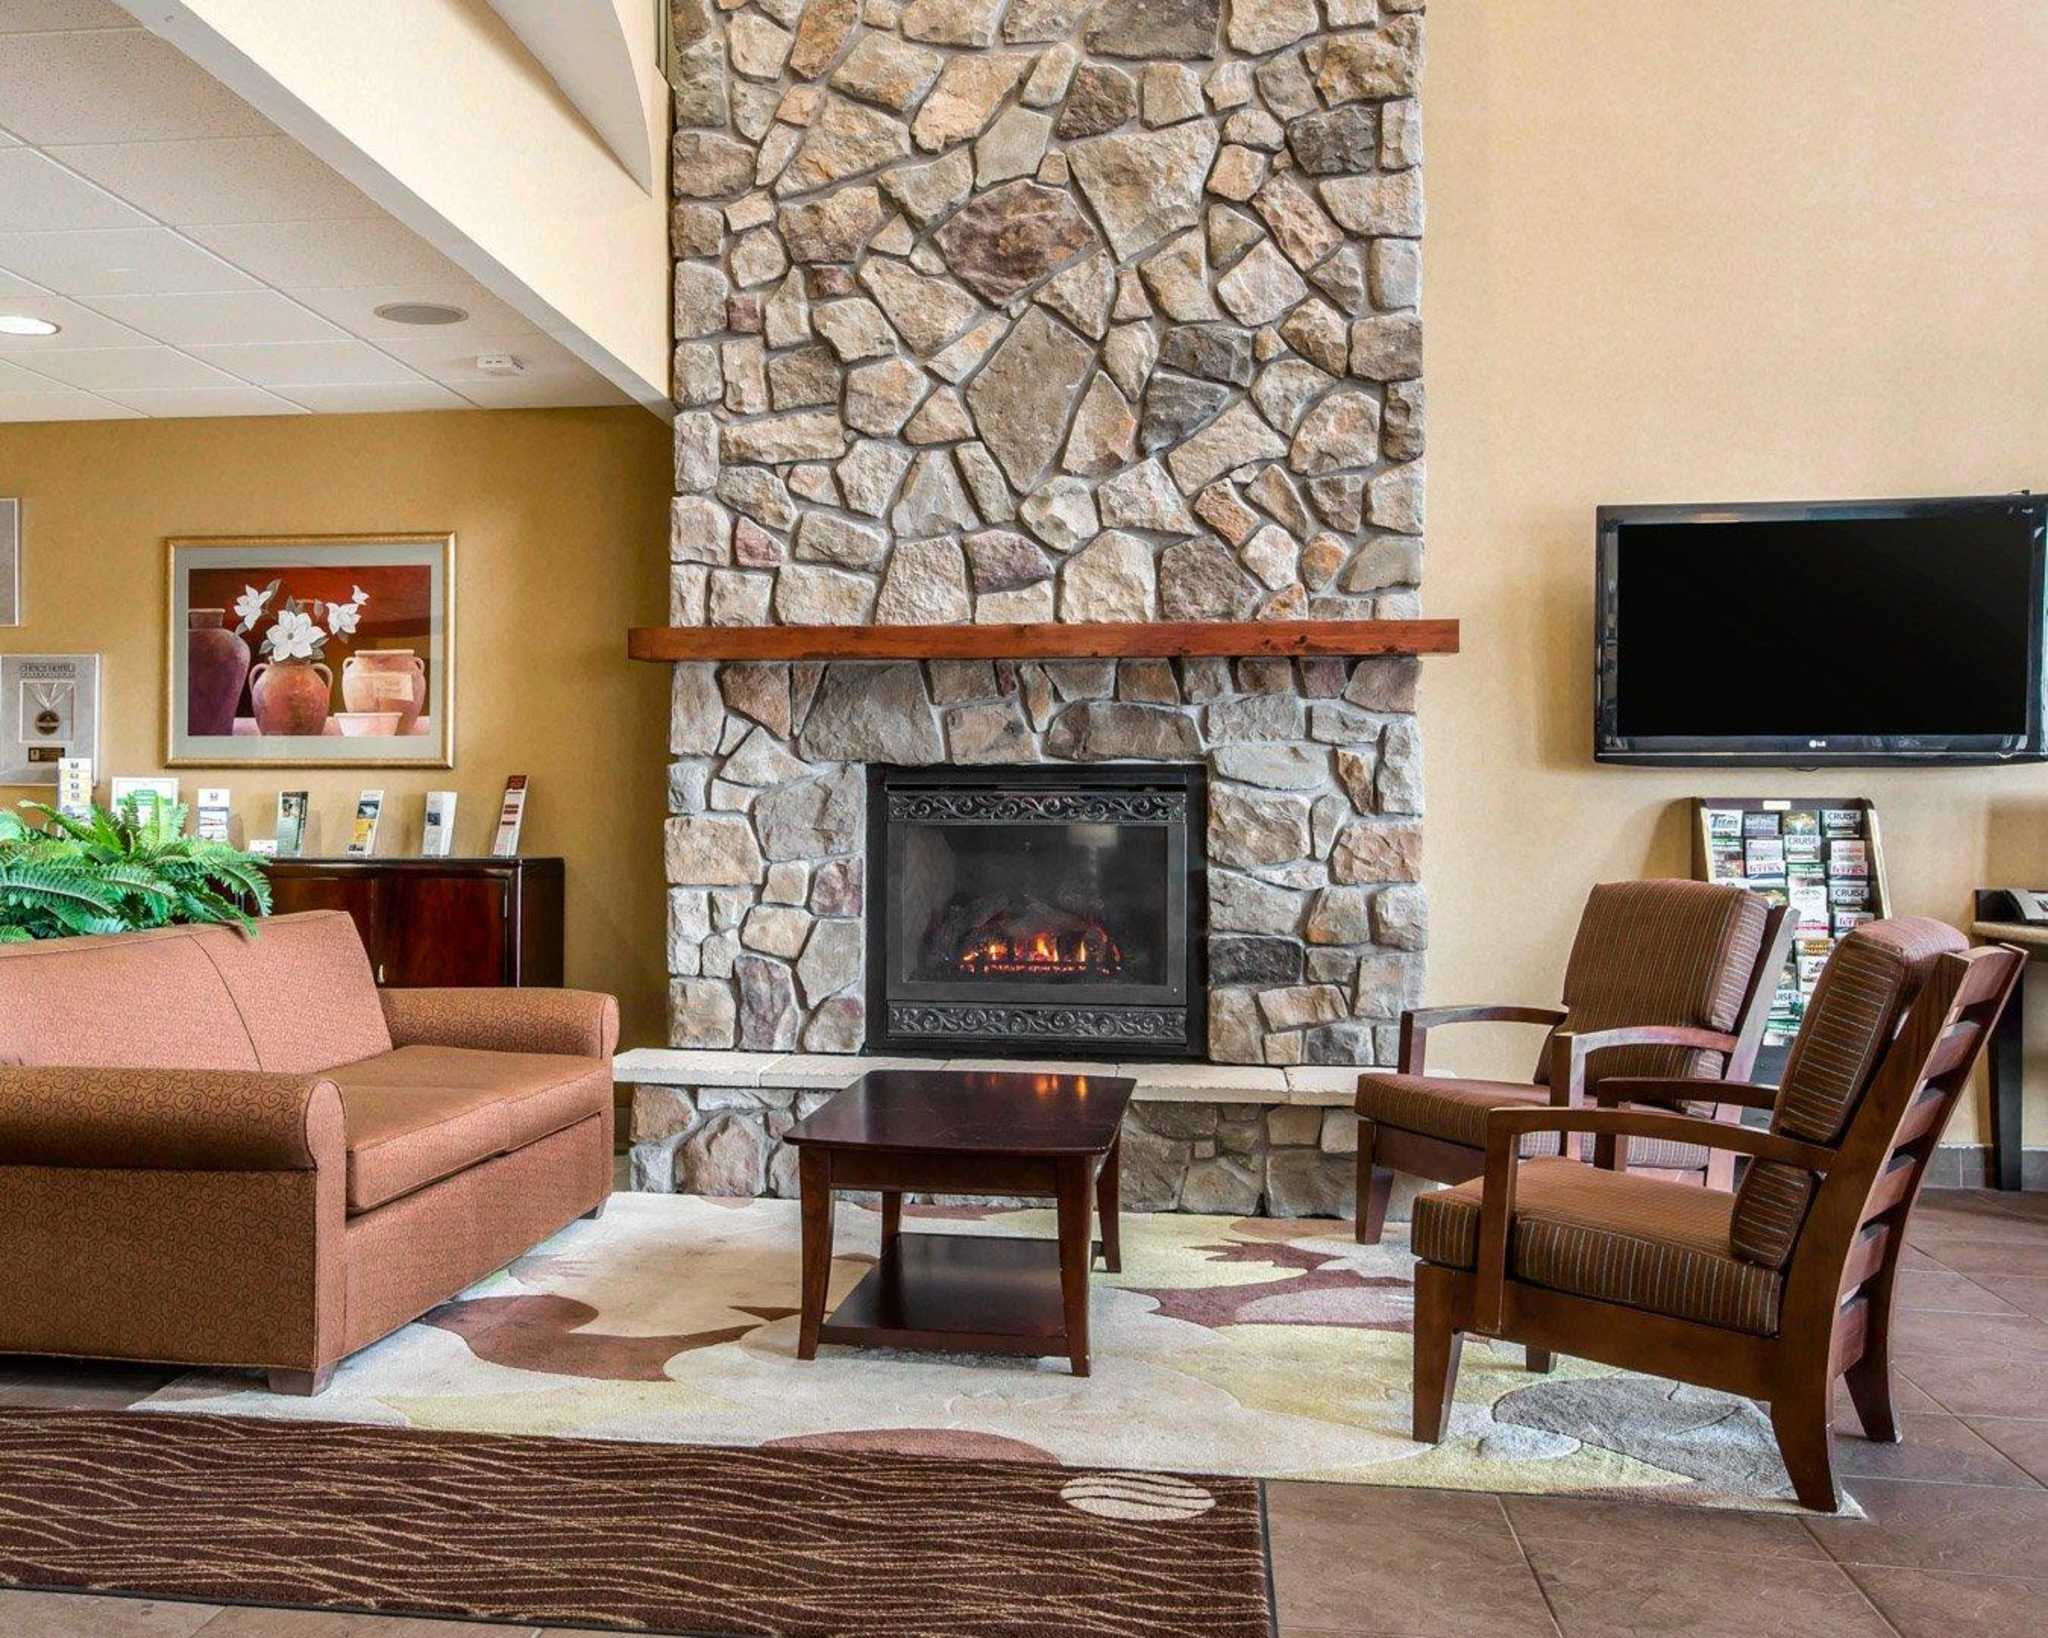 Comfort Inn & Suites adj to Akwesasne Mohawk Casino image 31